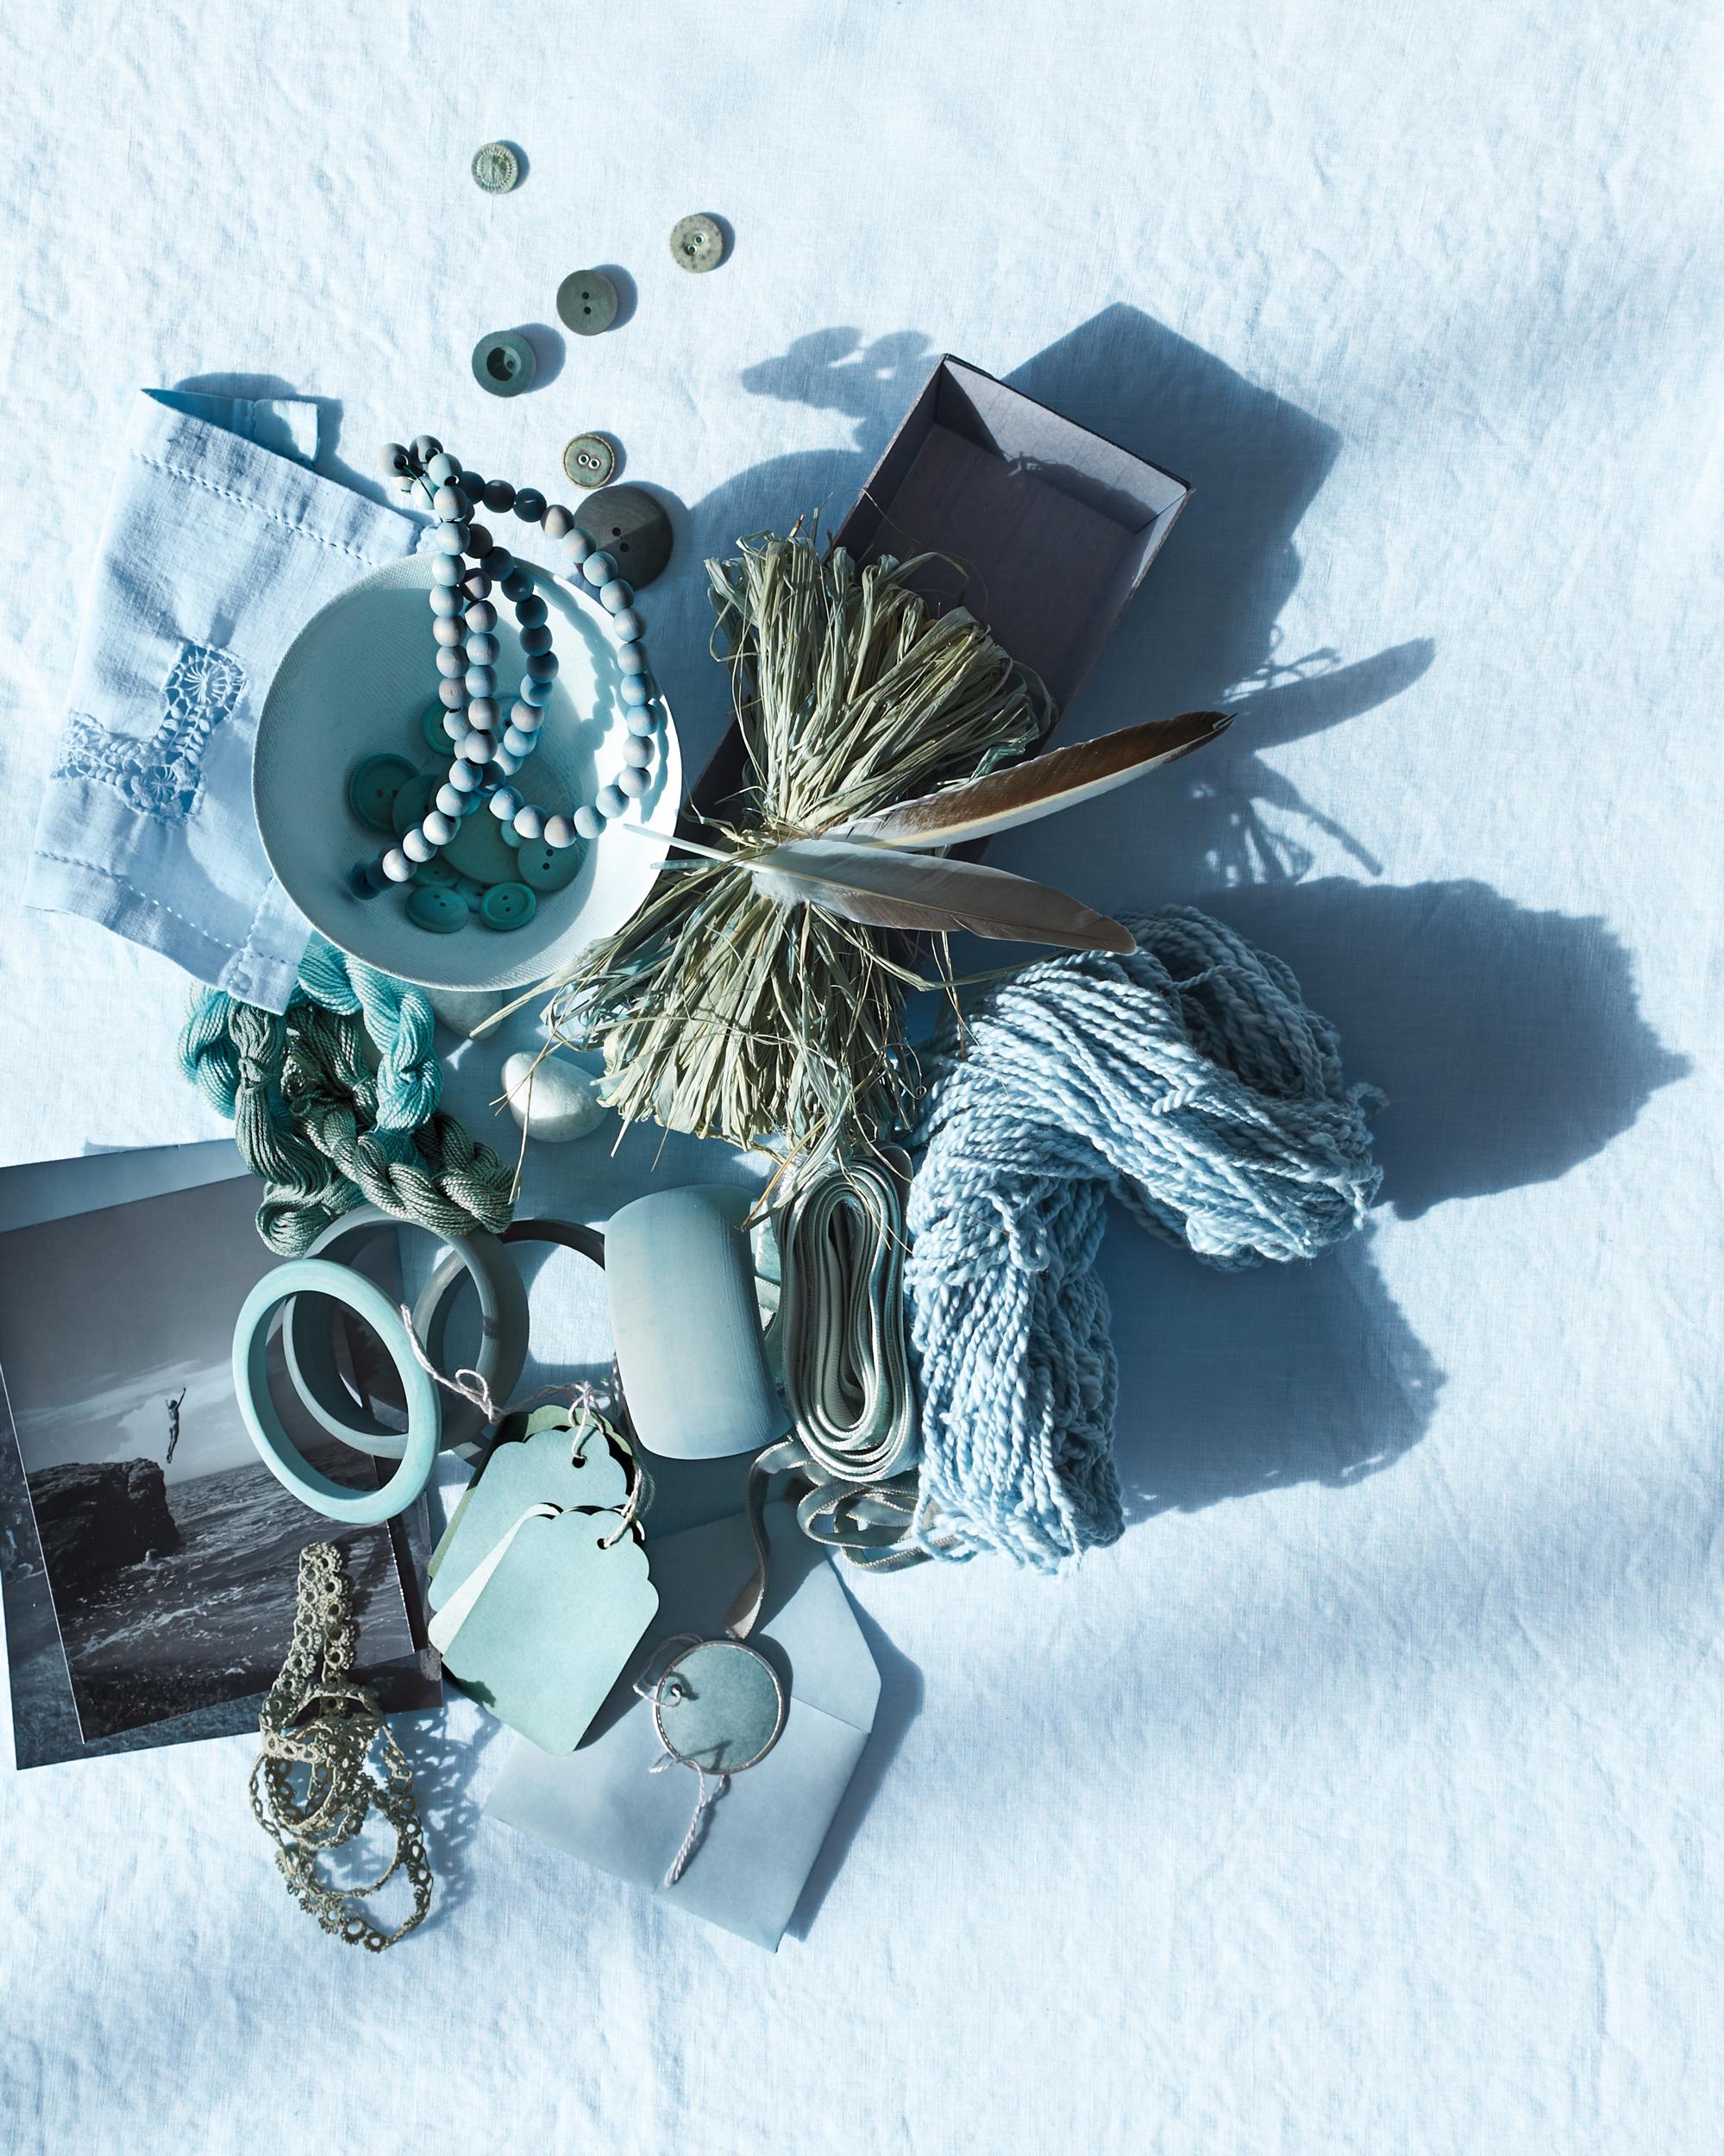 Mafter-dyed-items-1-d111888.jpg